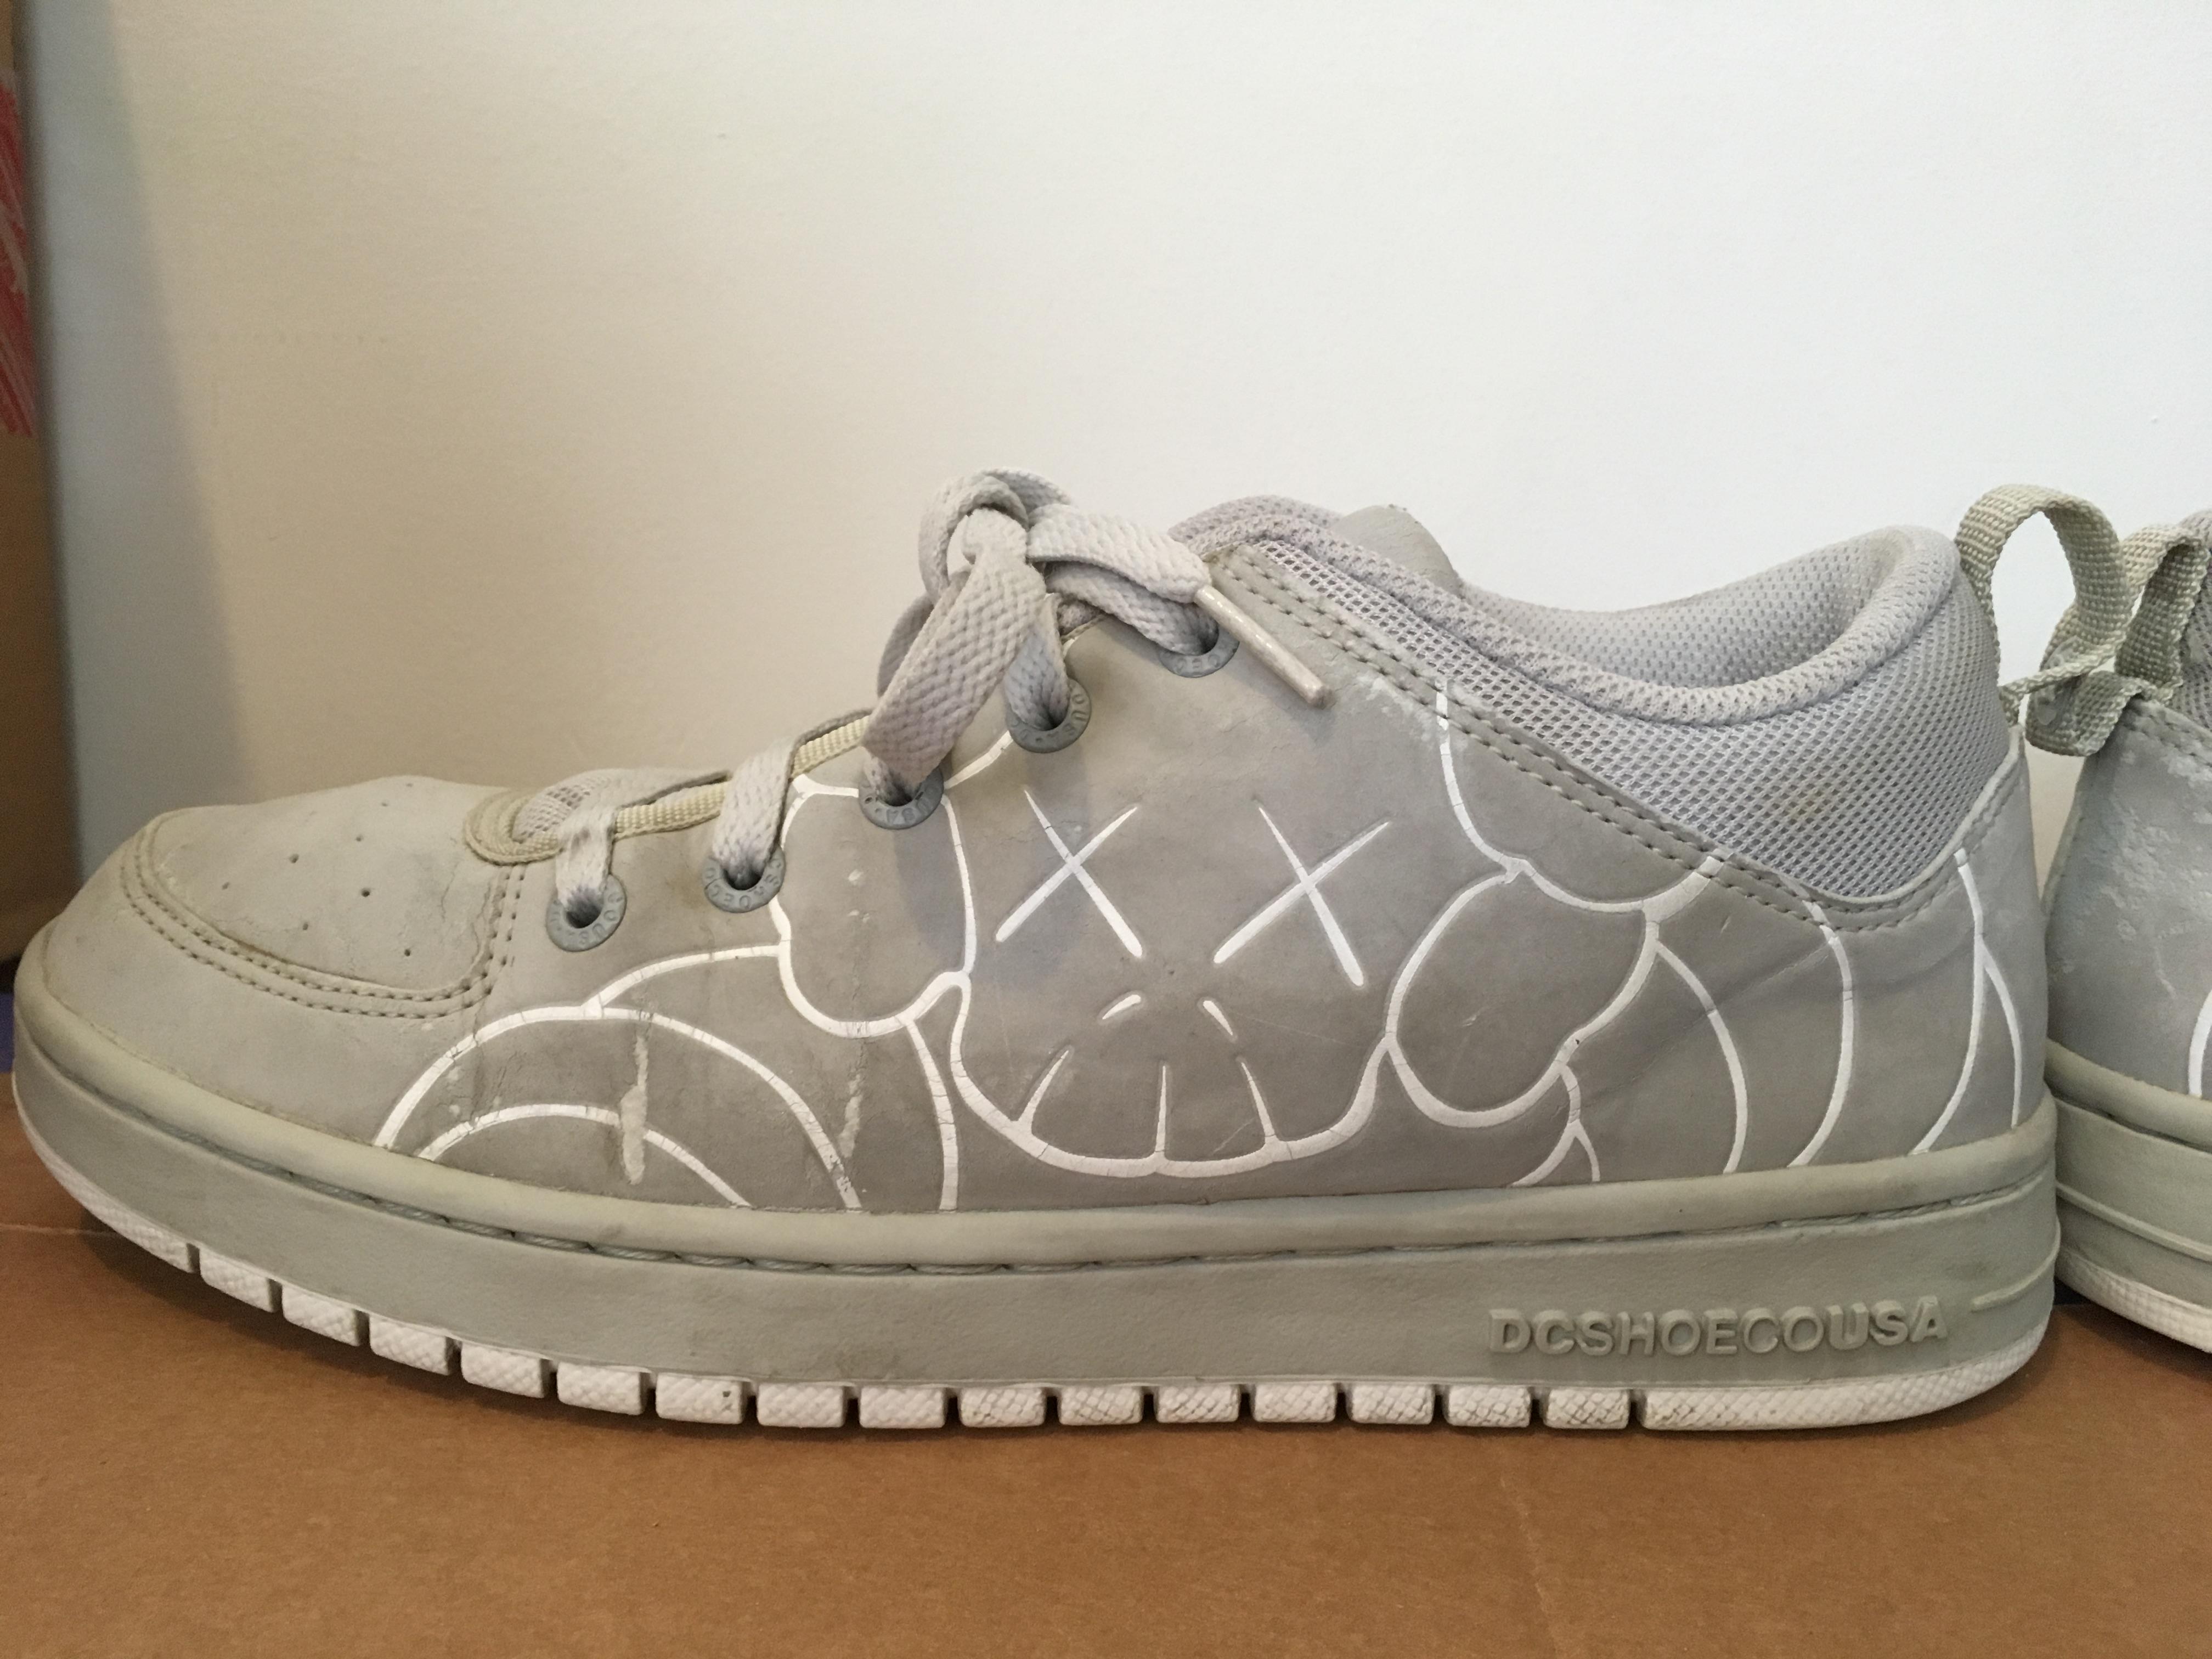 24153935 Dc Kaws X Dc Collab Shoes | Grailed